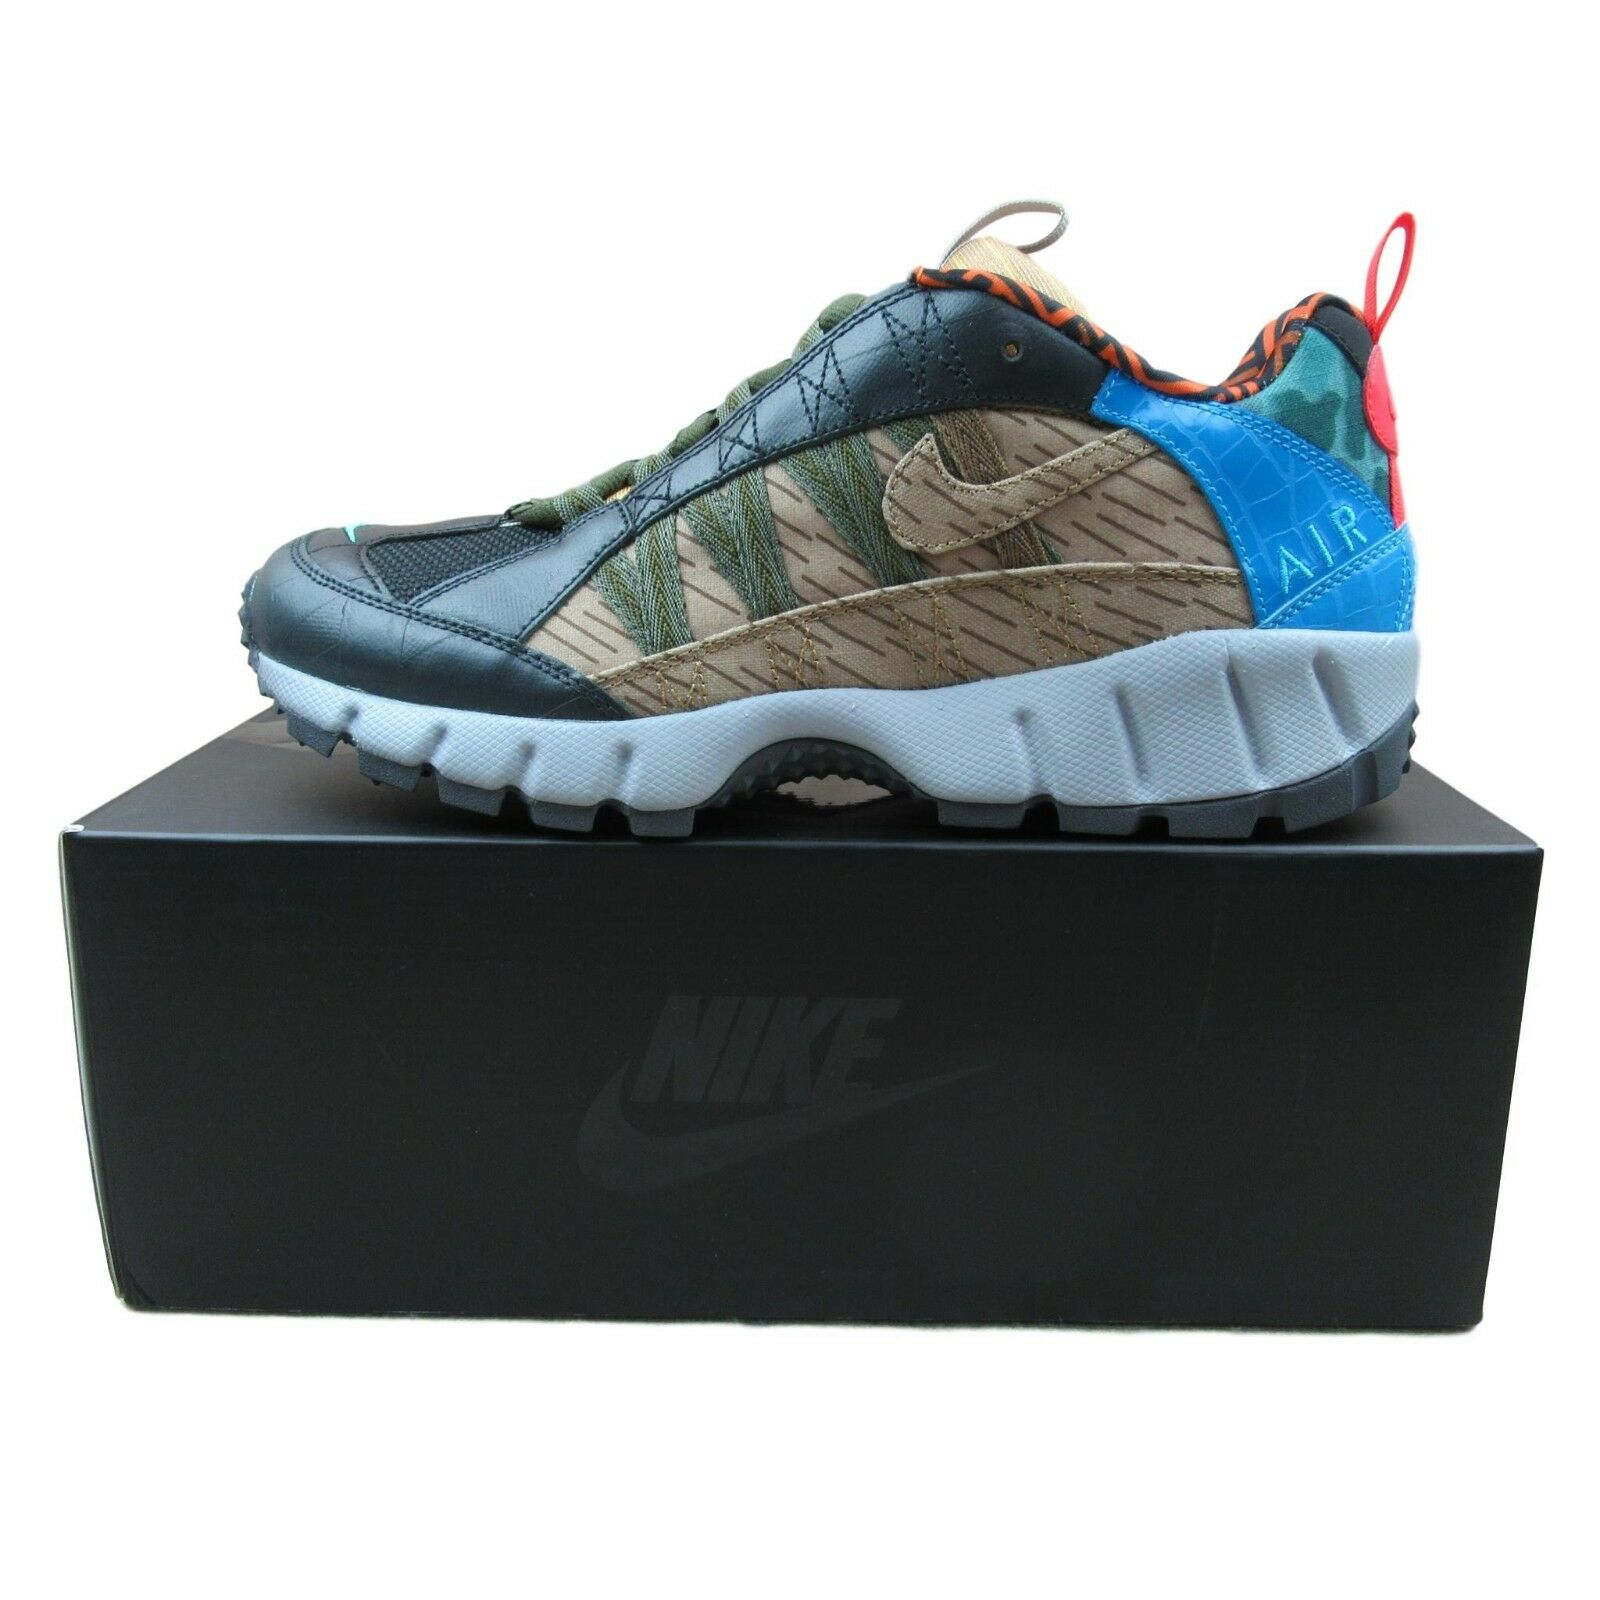 Nike Air Humara Size 17 Premium Trail Shoes Size Humara 9.5 Mens Black Blue AO2606 001 New a7ea0c